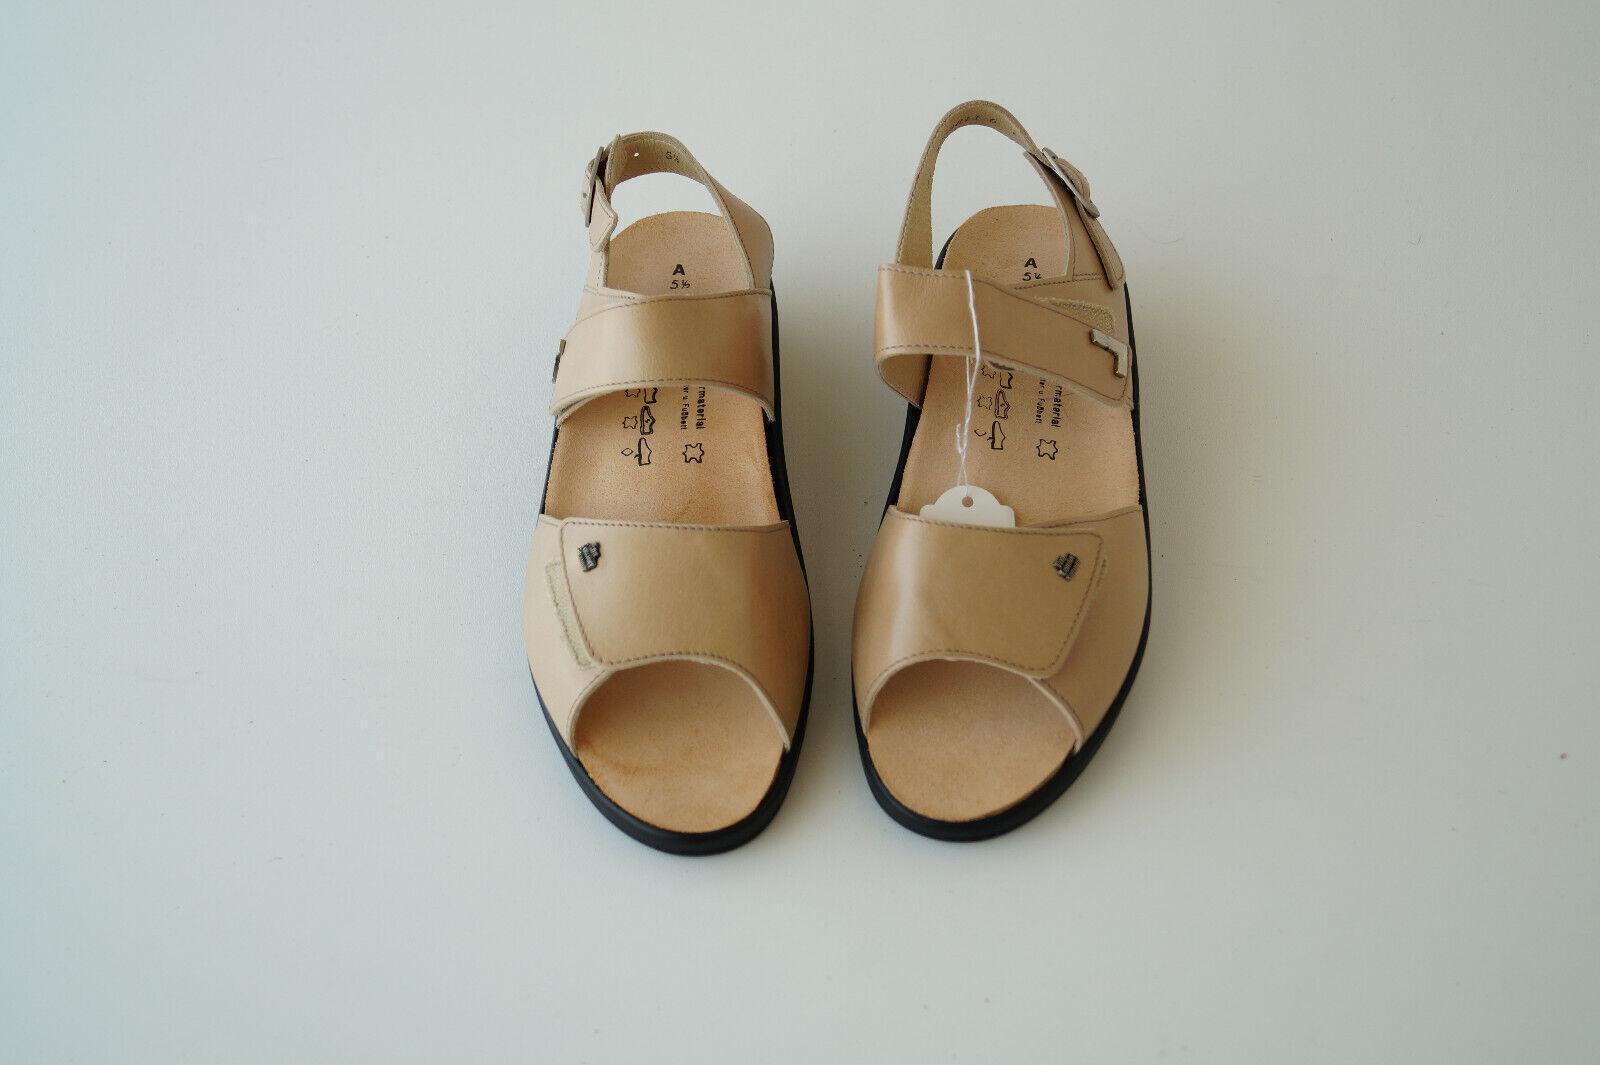 FINN COMFORT Hampton Schuhe Sandale Leder Einlagen Klett Gr.5,5   38,5 Beige NEU